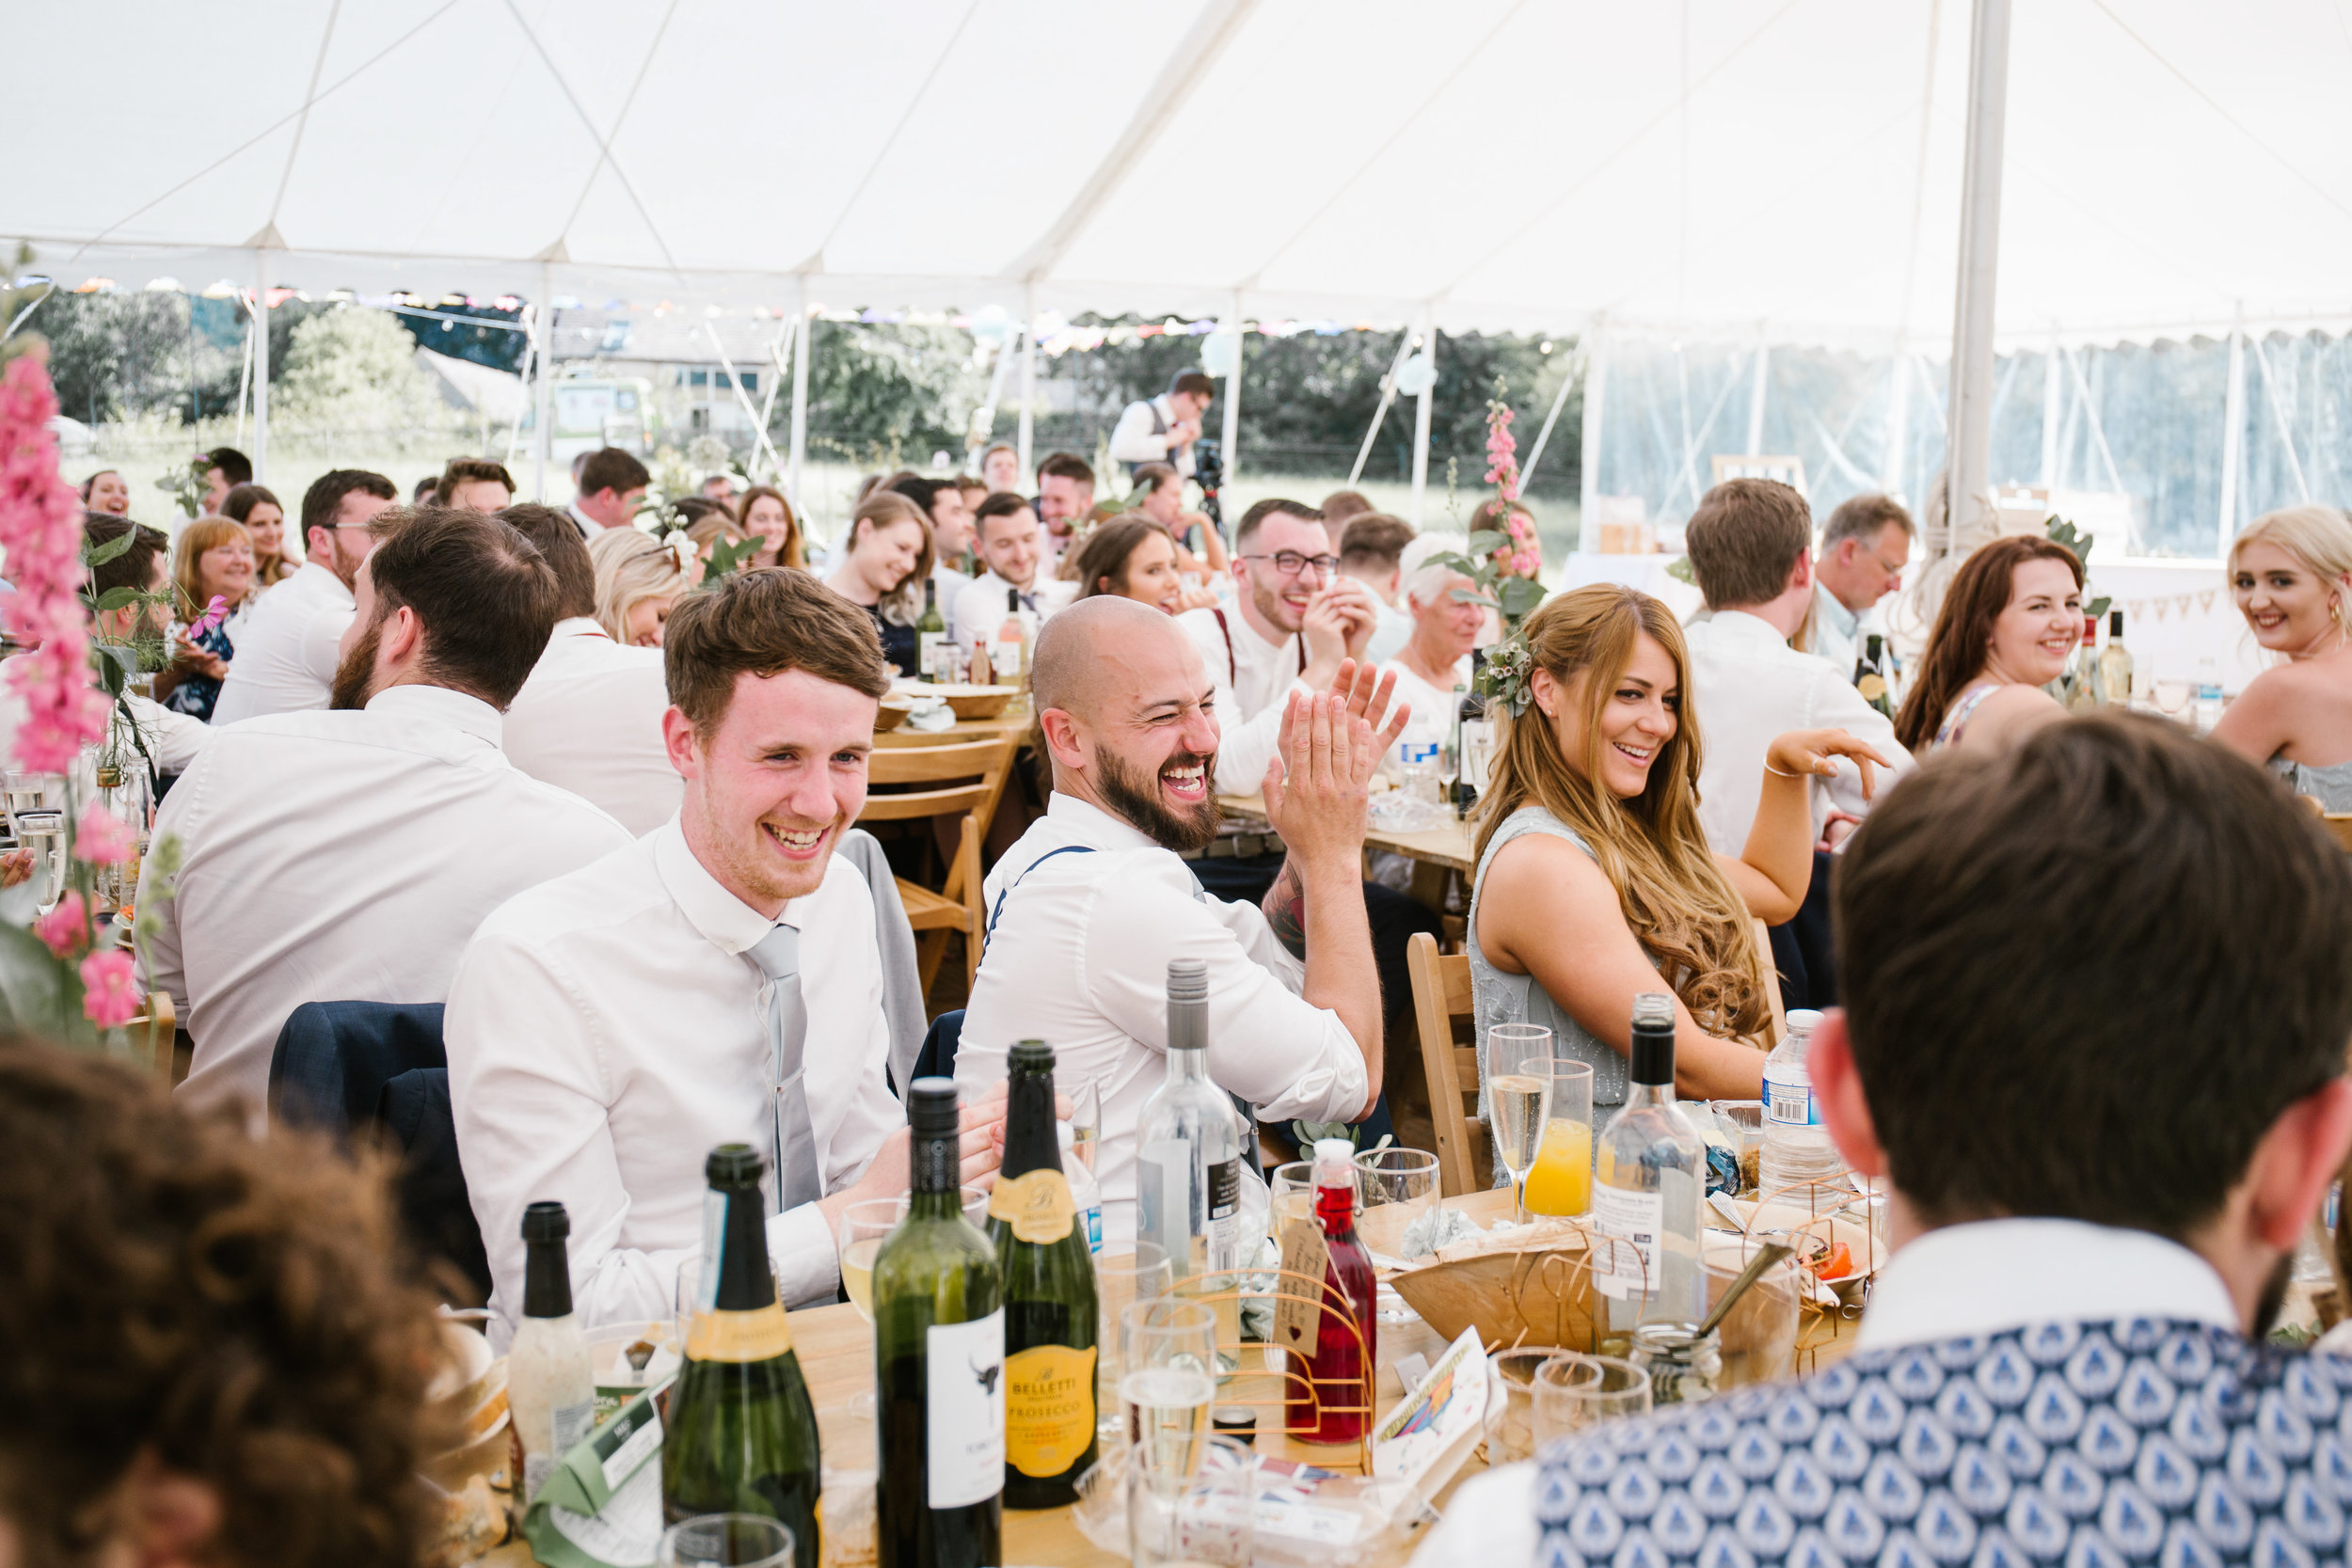 Cotswolds wedding, cotswolds wedding photographer, DIY wedding, forest wedding, marquee wedding, fun wedding, alternative wedding-333.jpg